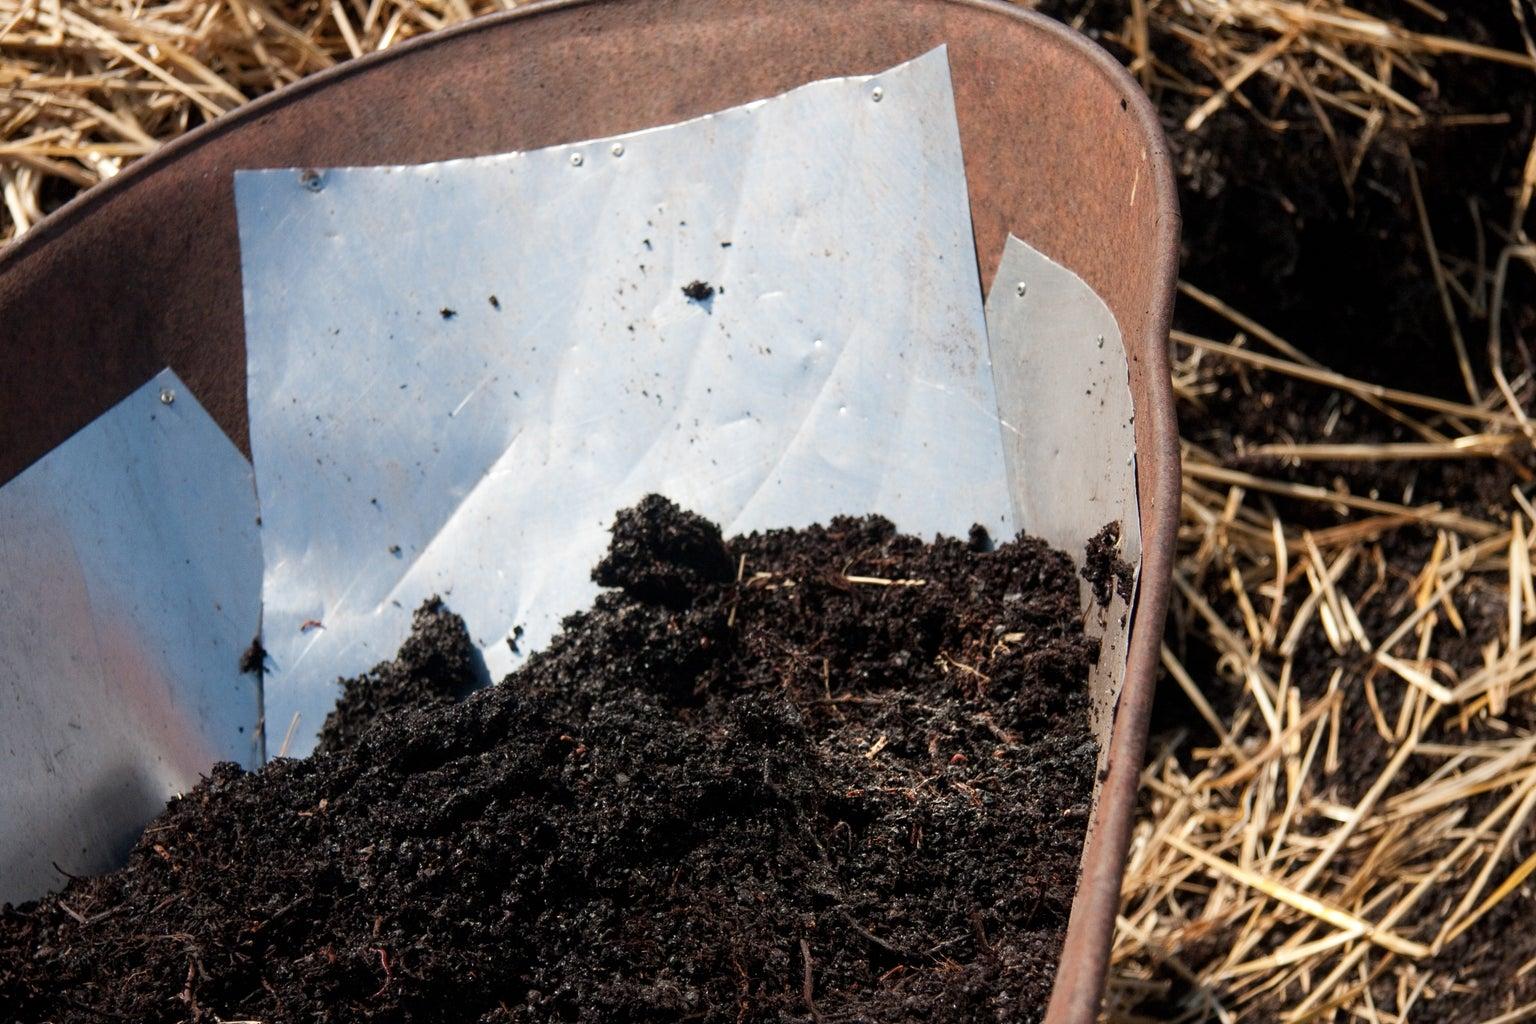 How to Repair a Rusty Wheelbarrow